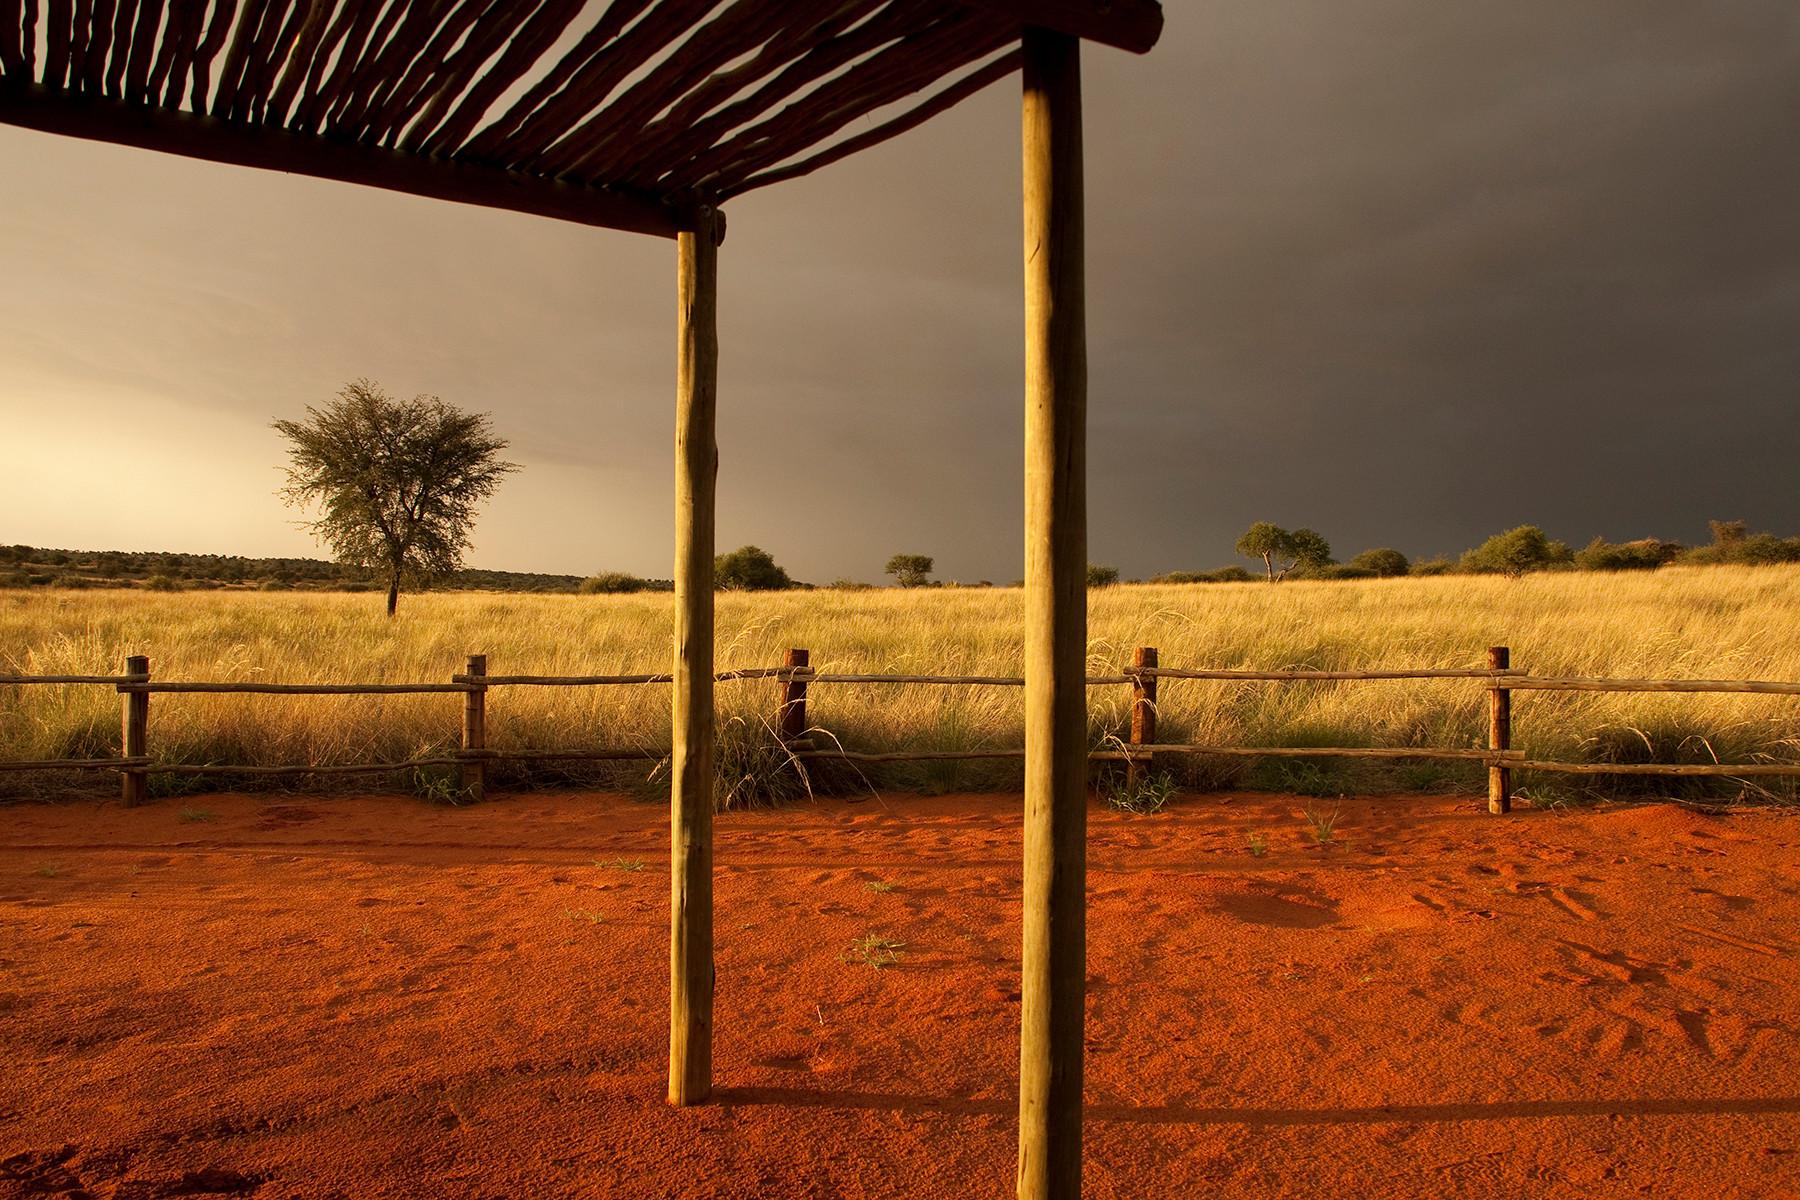 Namibia 2012 (Bagatelle)